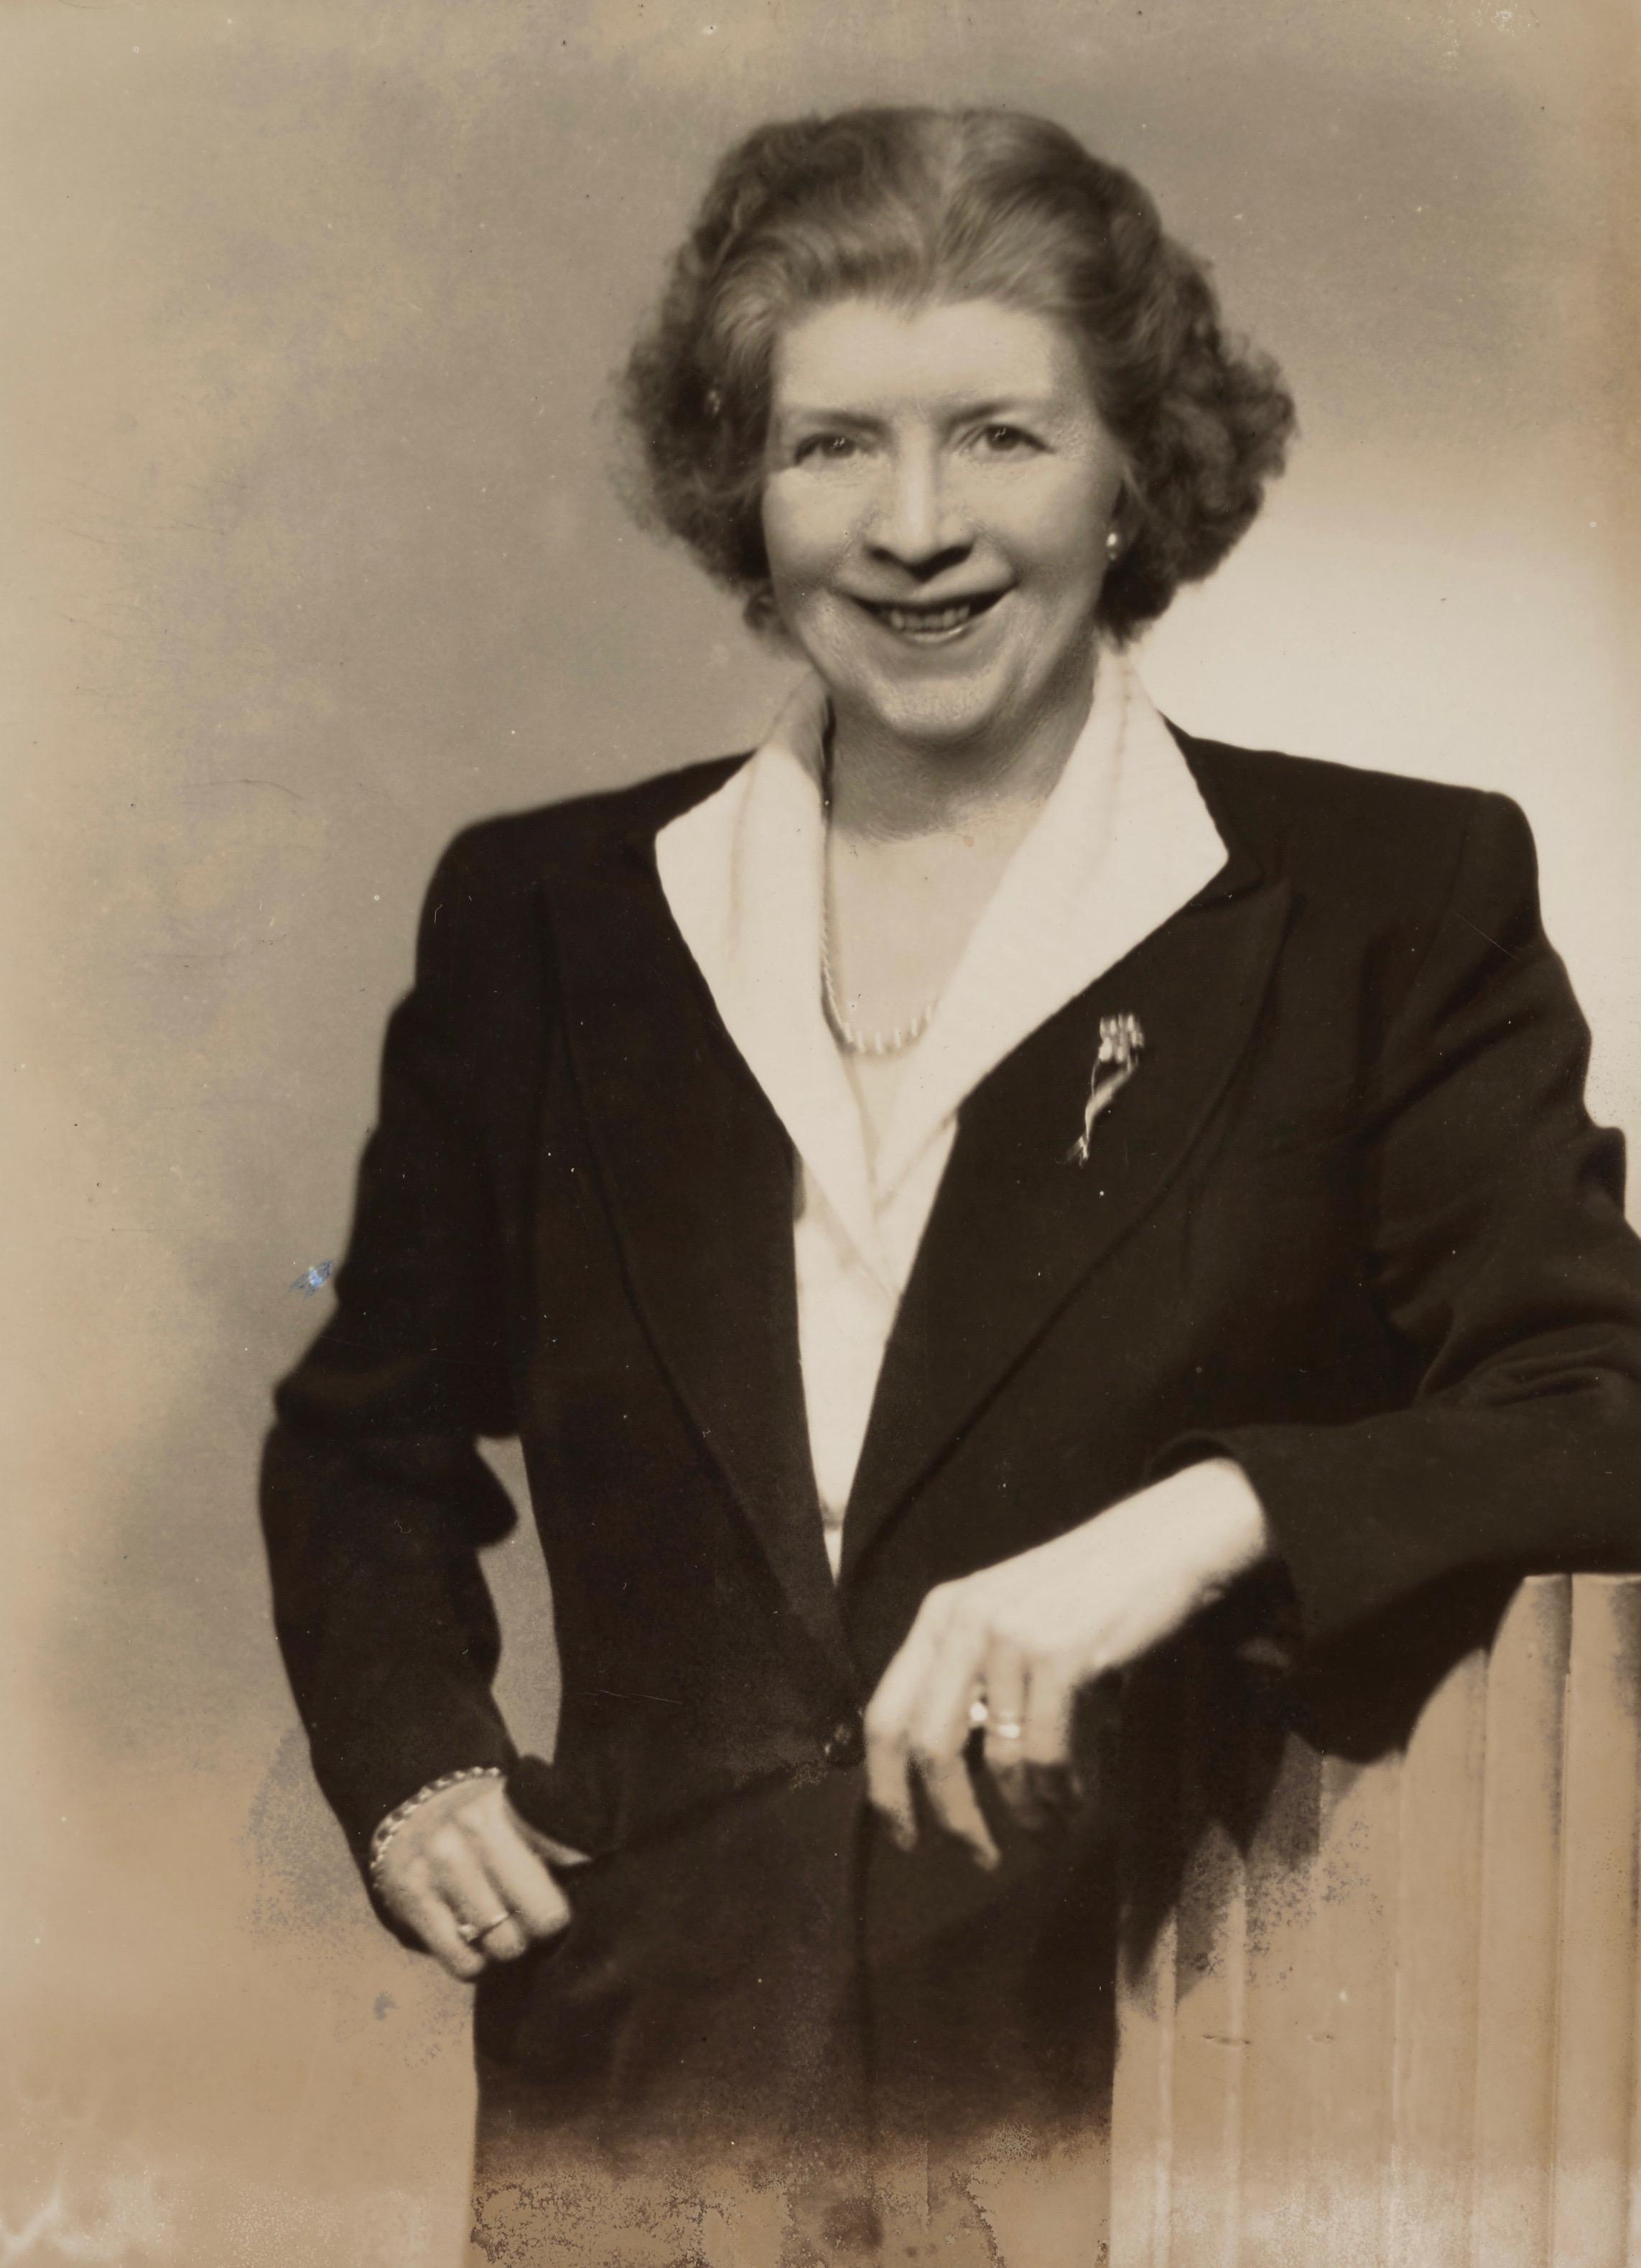 Black and white photograph portrait of Margaret Fishback